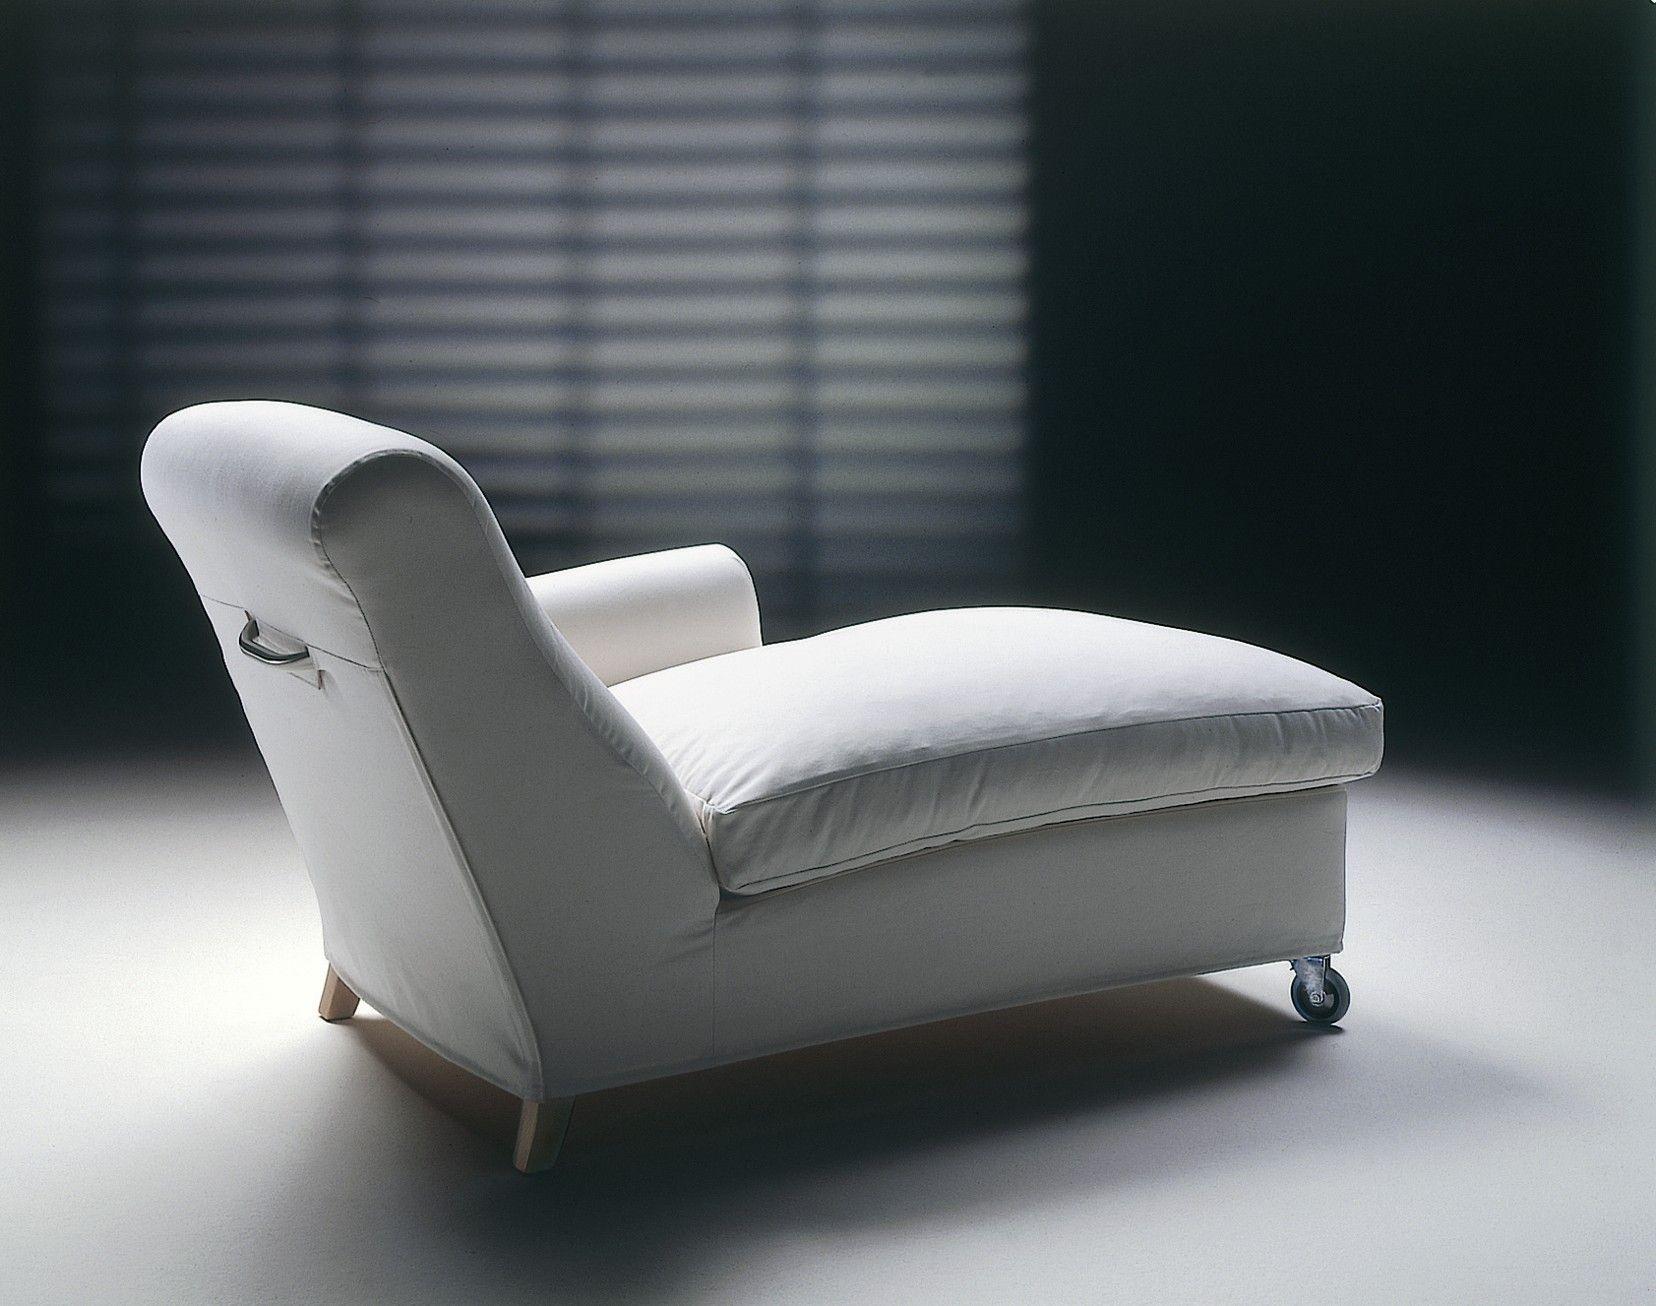 Flexform Nonnamaria Fauteuil.Flexform Nonnamaria Chiaselongue 1985 Flexform Furniture